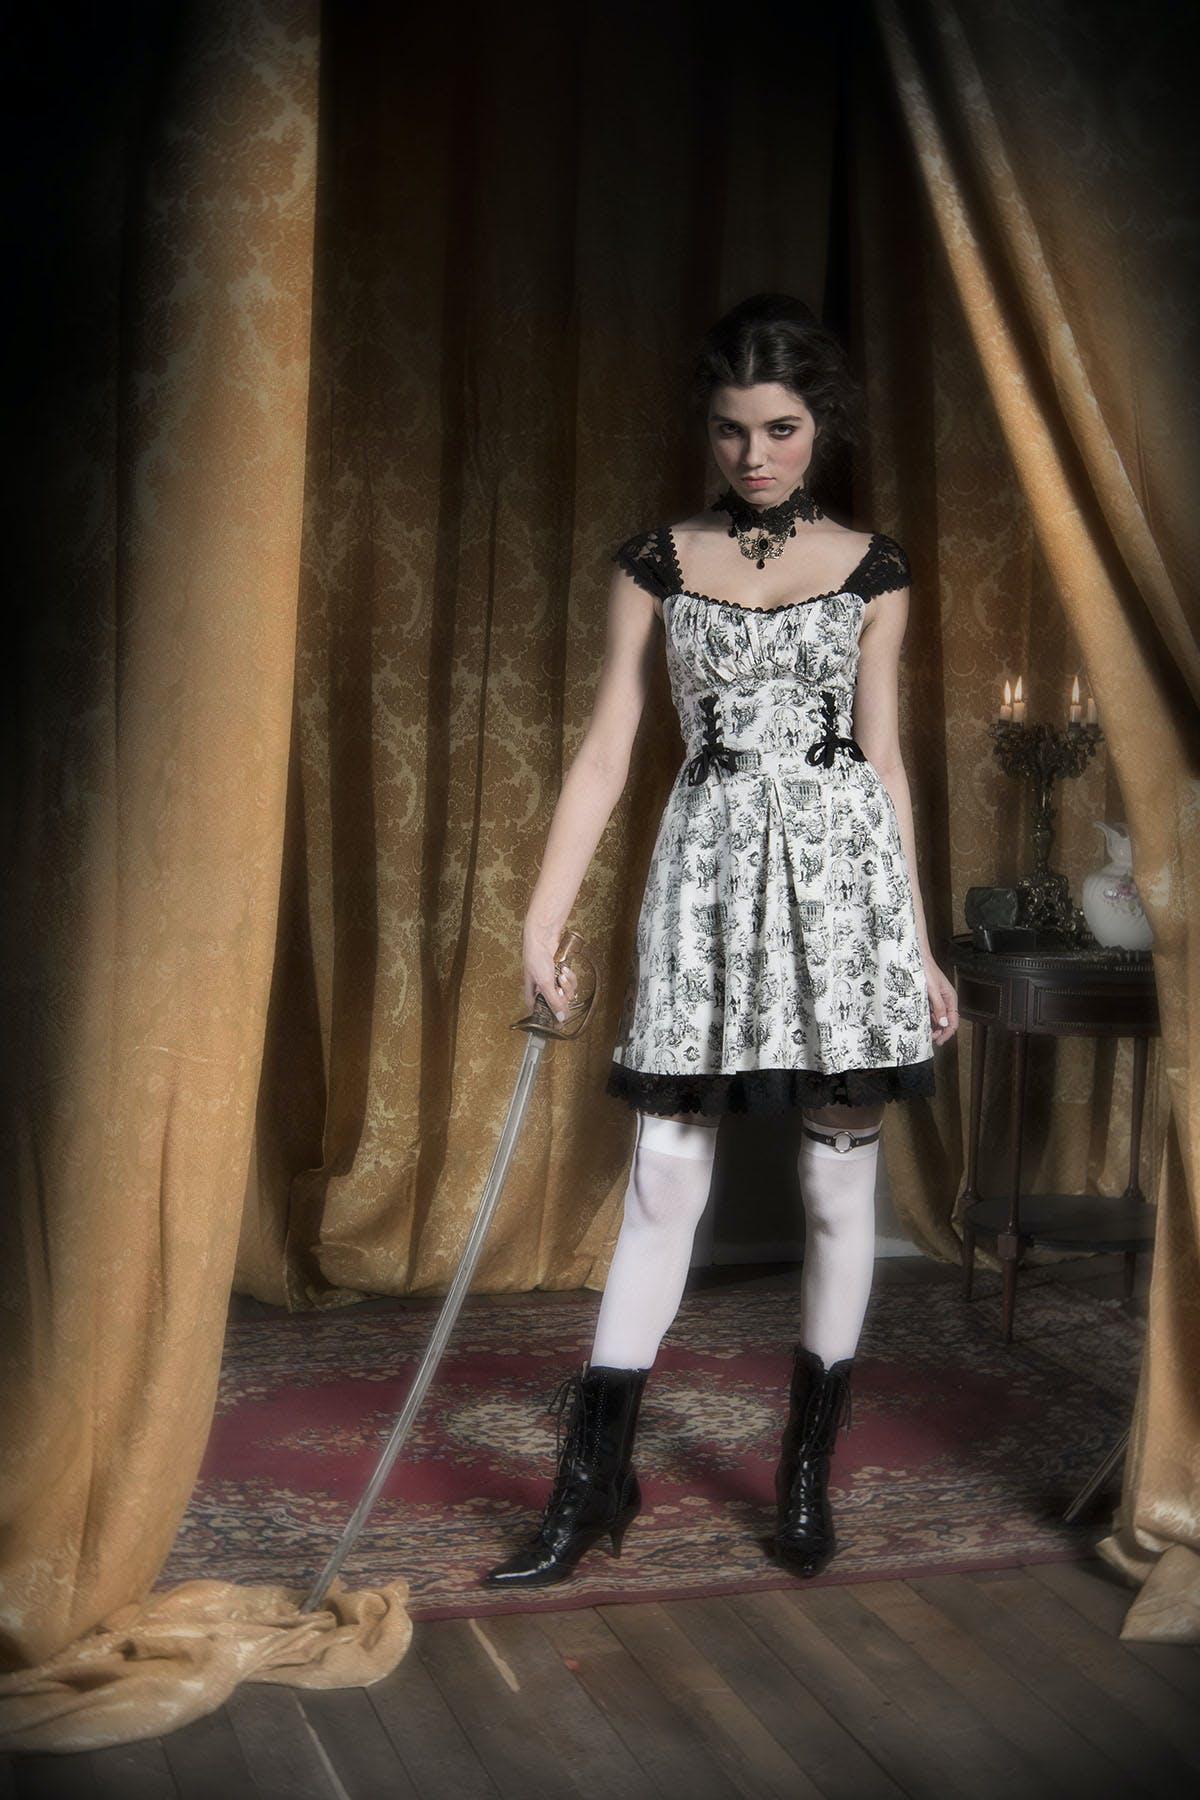 Lace-up sweetheart dress ($54.50)